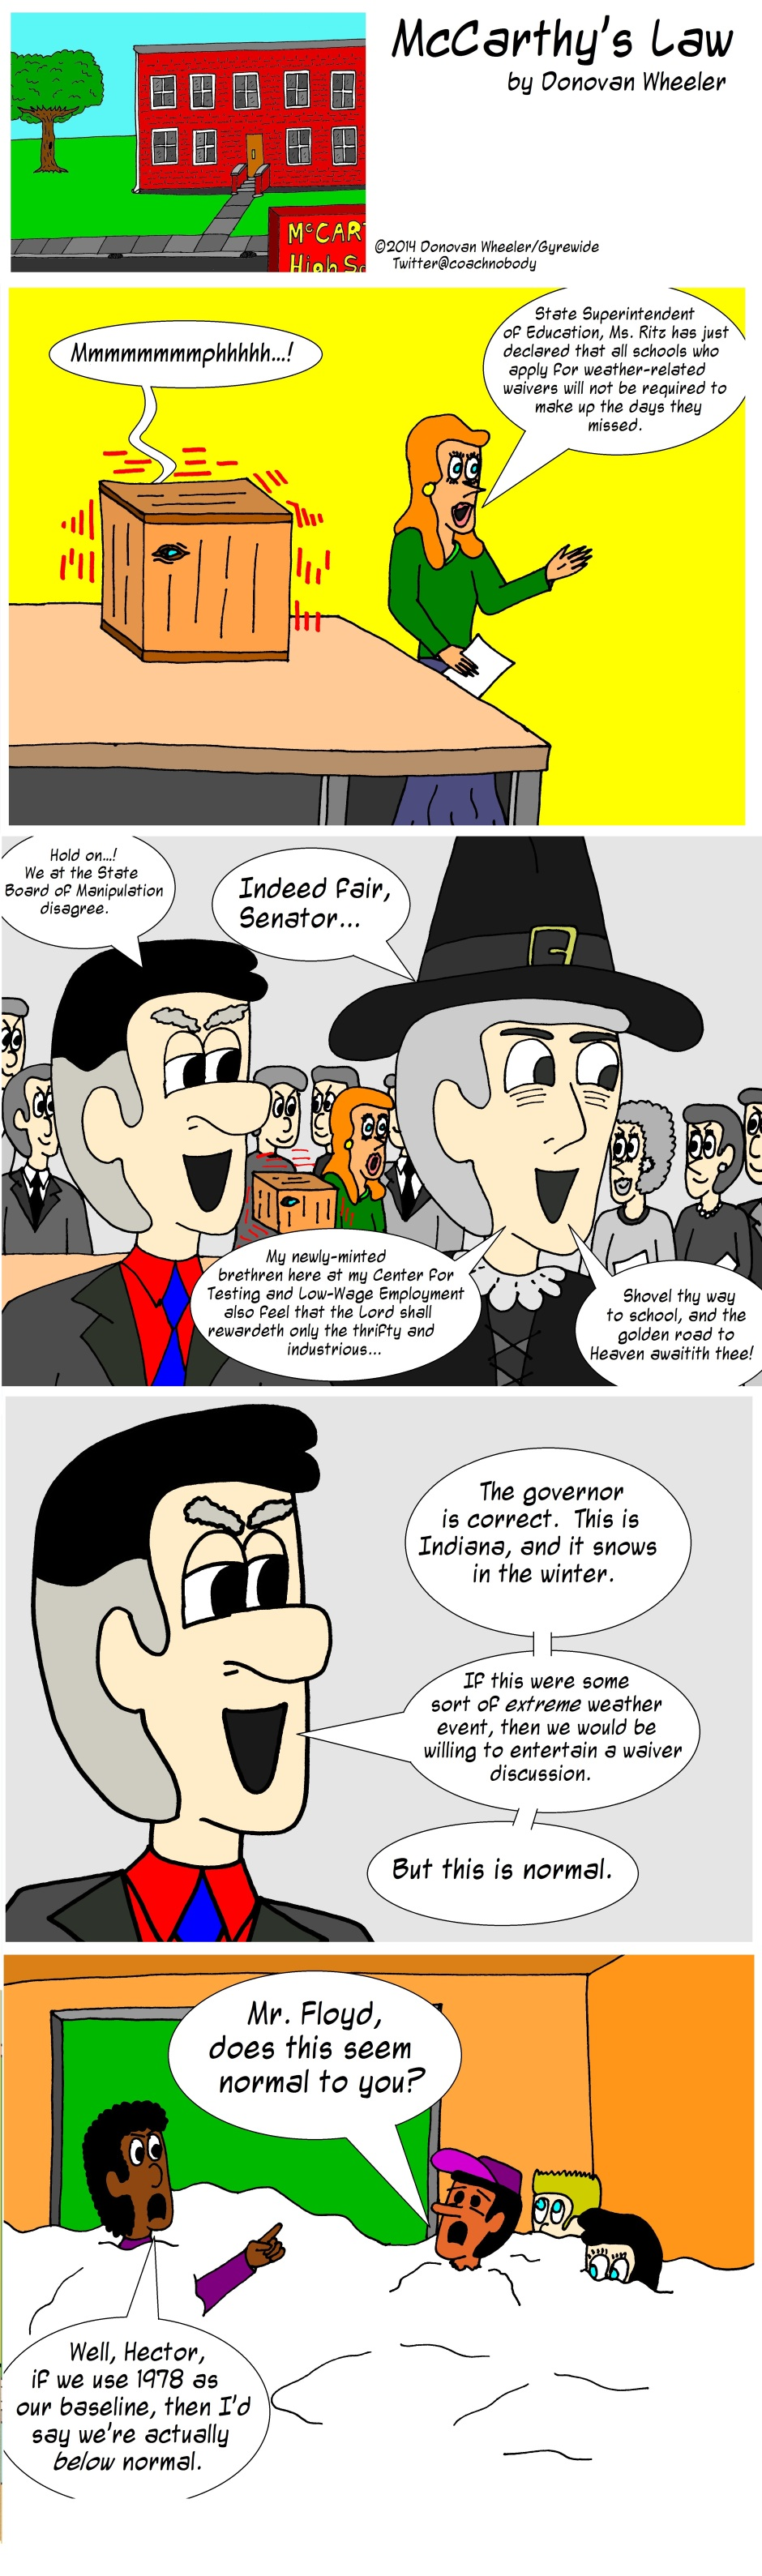 McCarthy's Law 168